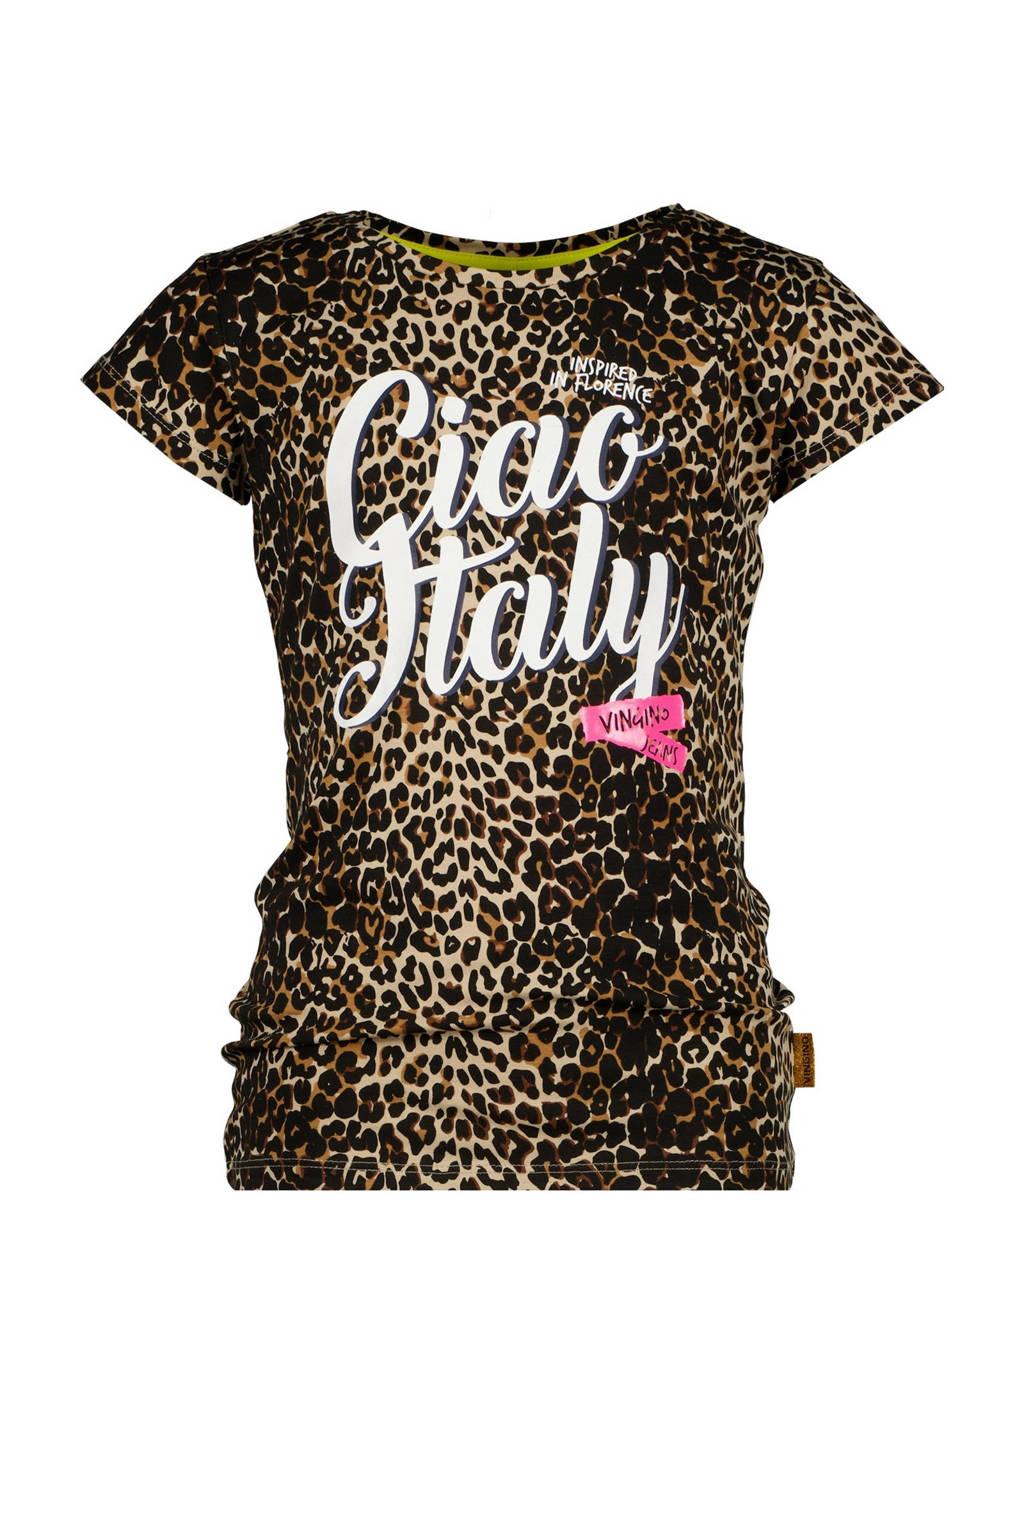 Vingino T-shirt Hilla met panterprint lichtbruin/bruin, Lichtbruin/bruin